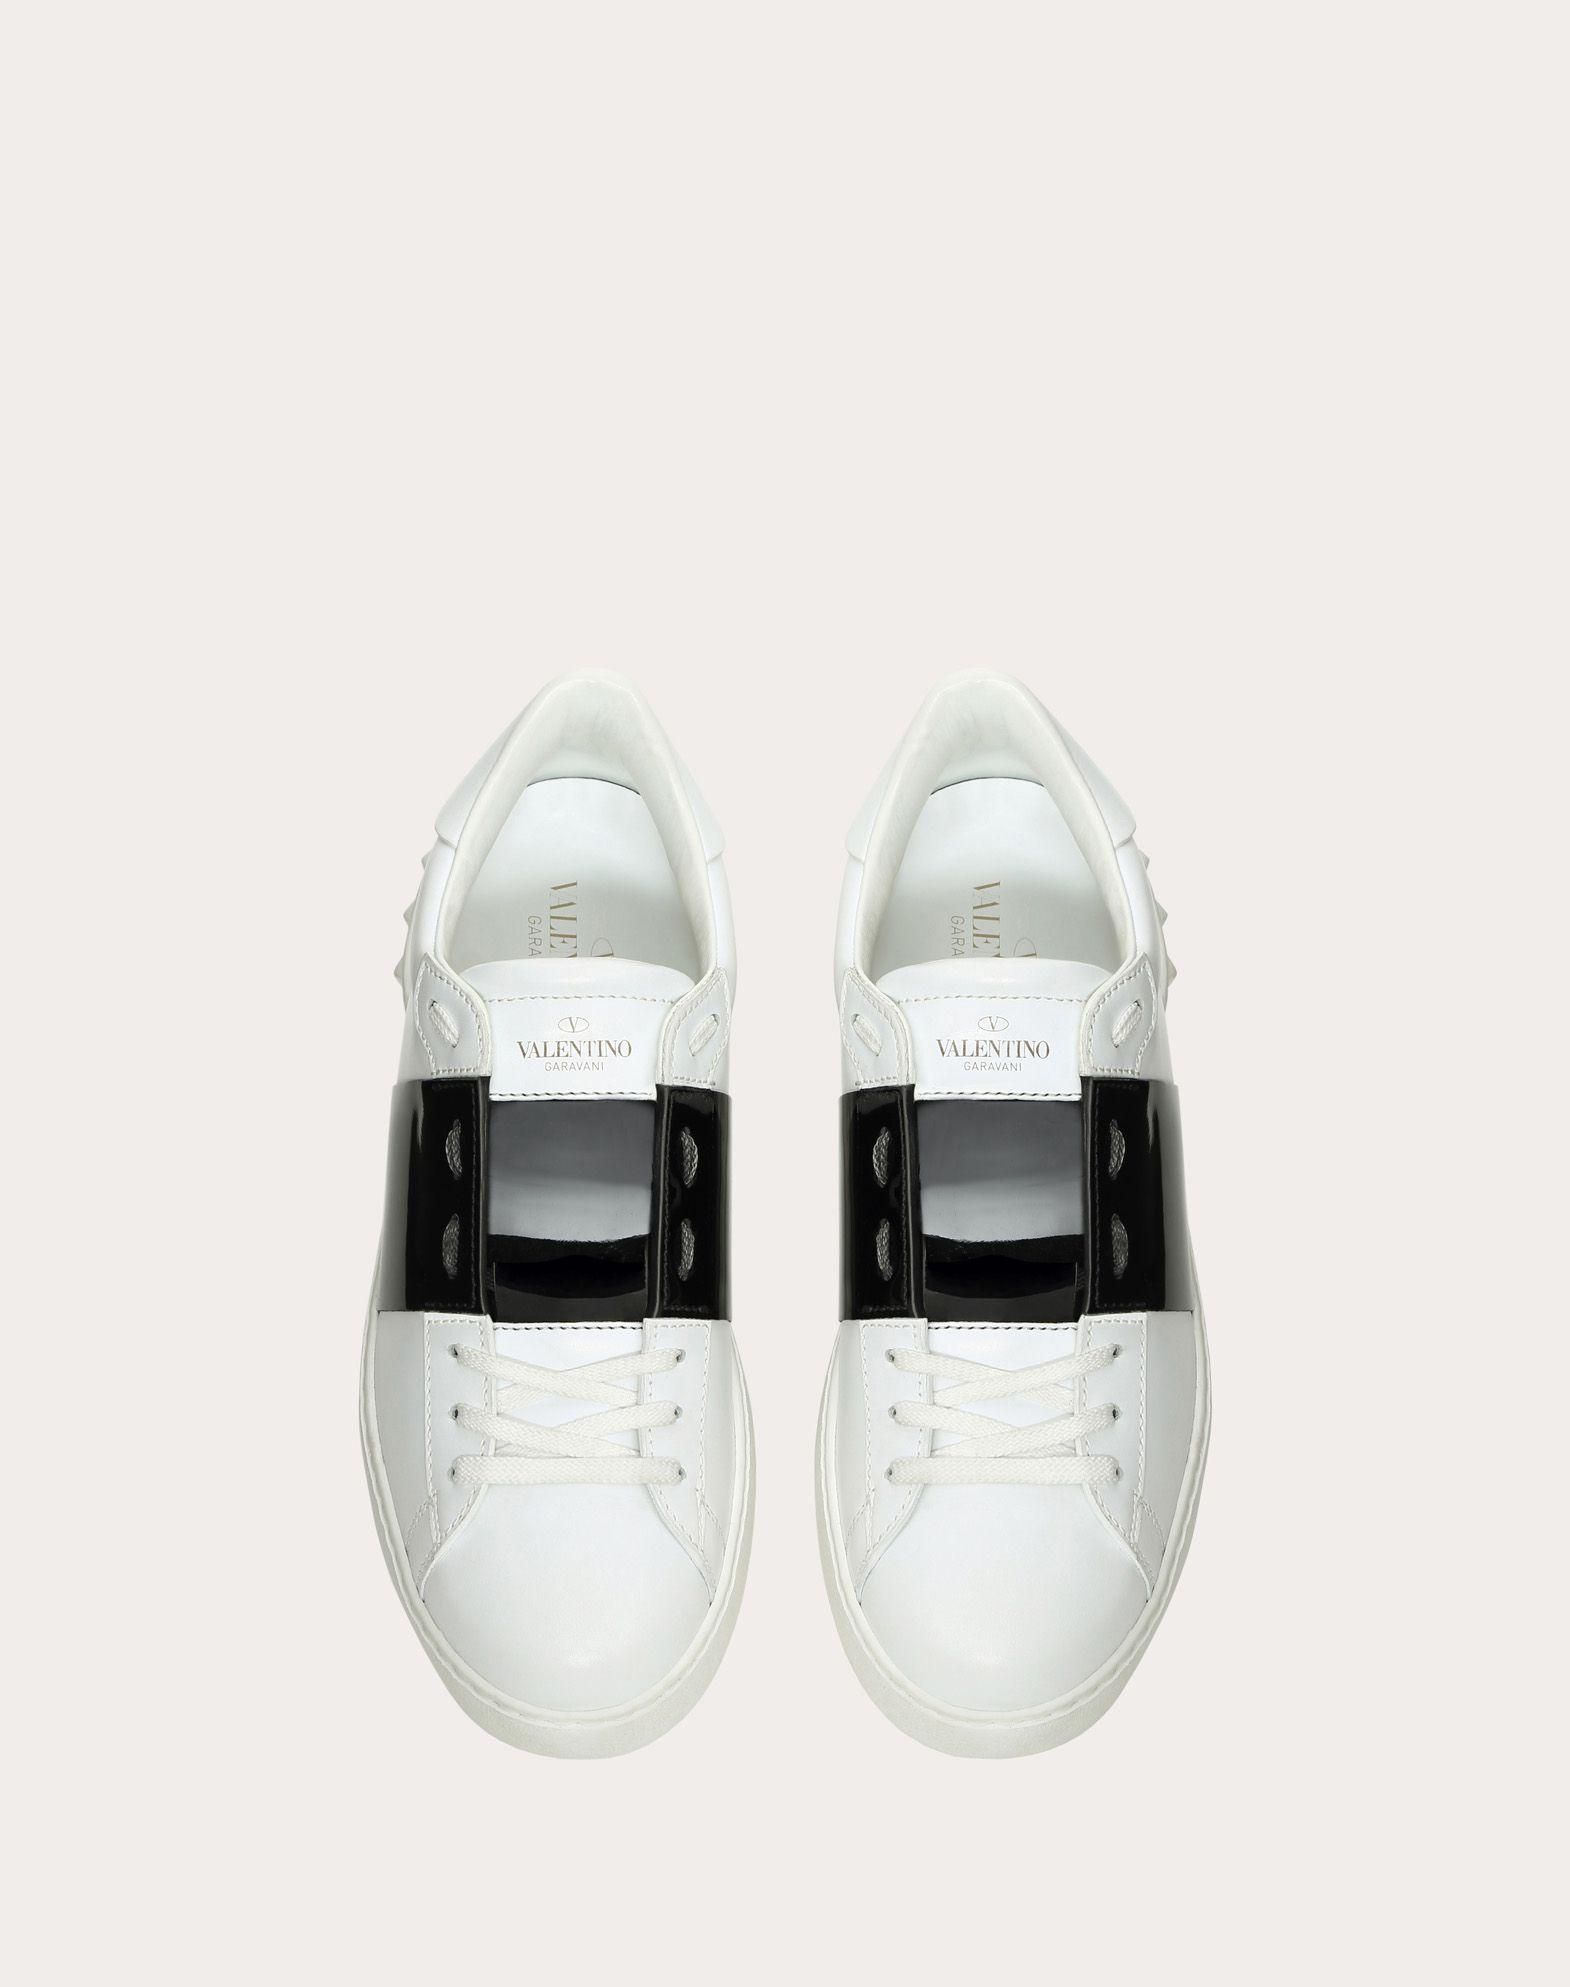 VALENTINO GARAVANI UOMO Open Sneaker LOW-TOP SNEAKERS U e